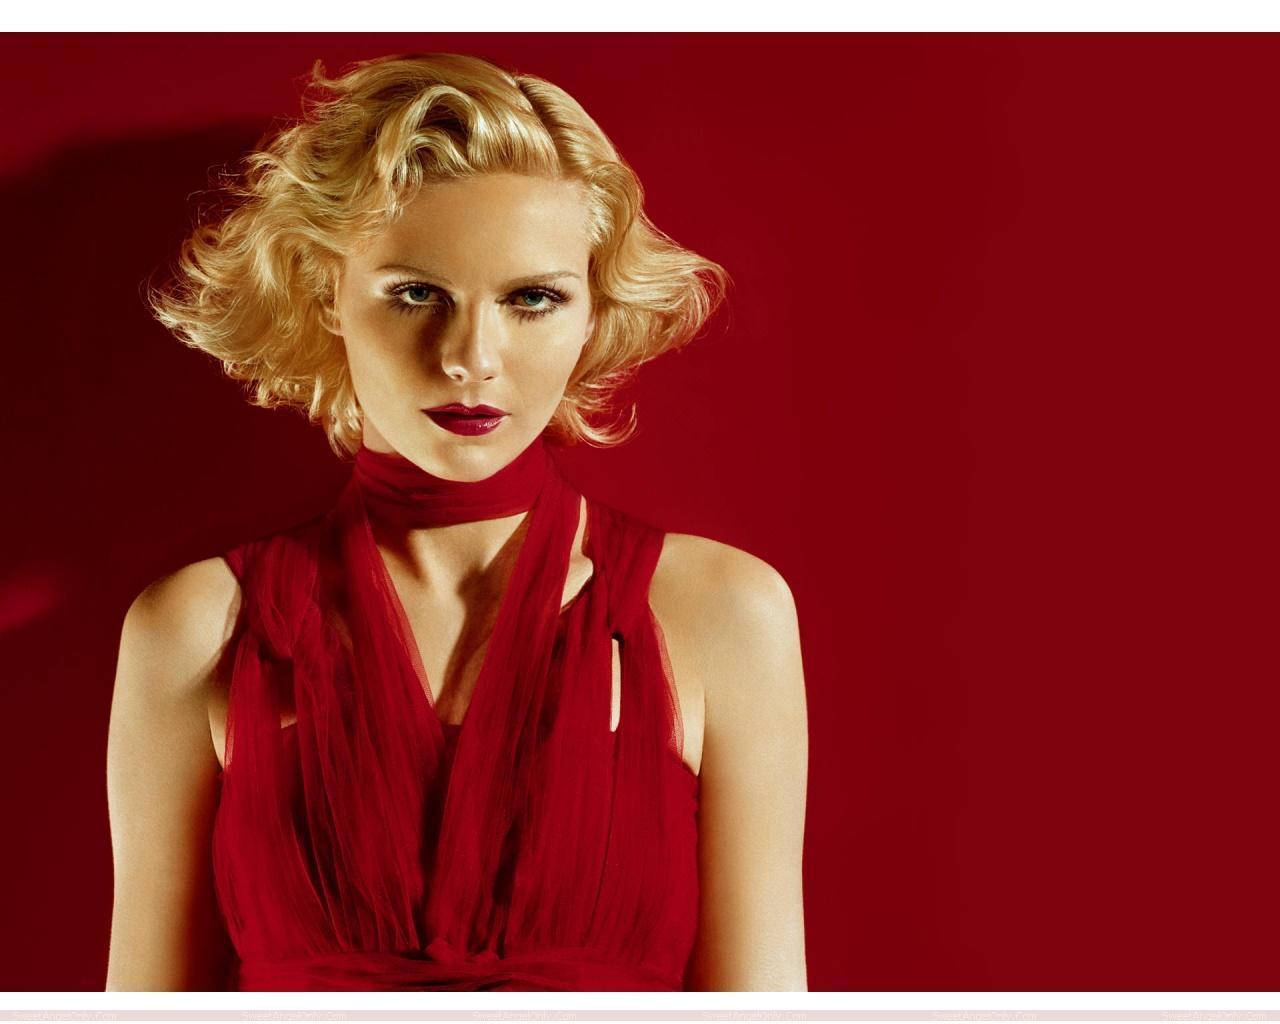 http://1.bp.blogspot.com/-eZkB7JrgSiE/TX38Hl63W-I/AAAAAAAAFf0/MJboKsAqSmg/s1600/actress_kirsten_dunst_hot_wallpaper_sweetangelonly_10.jpg